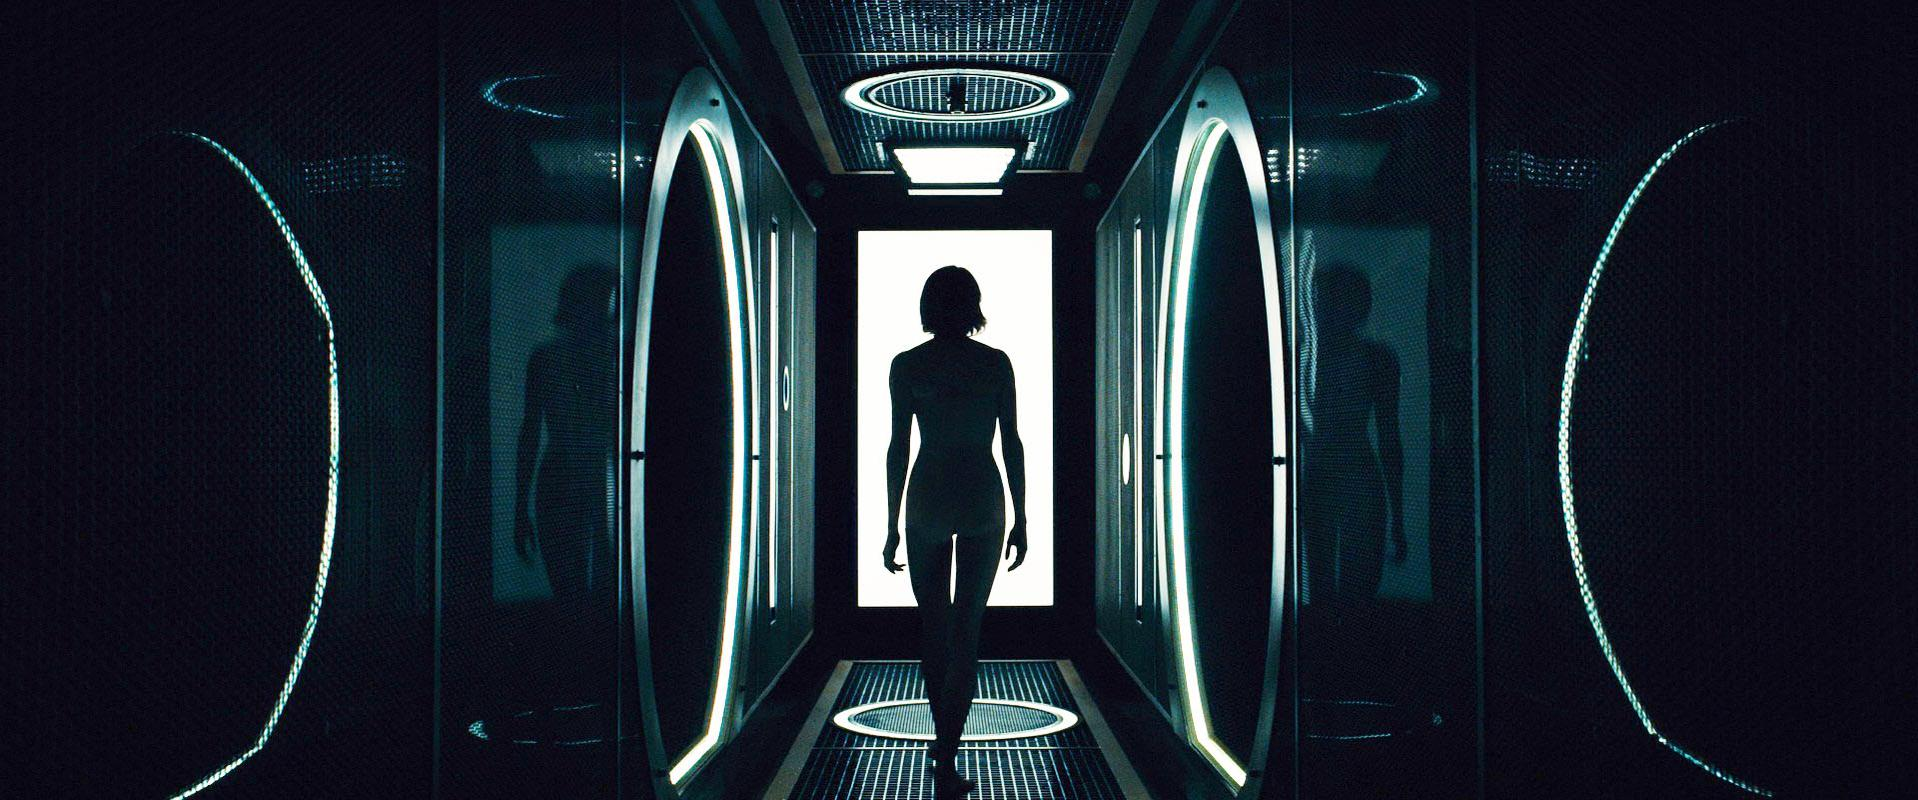 Shailene Woodley nude - Allegiant (2016)